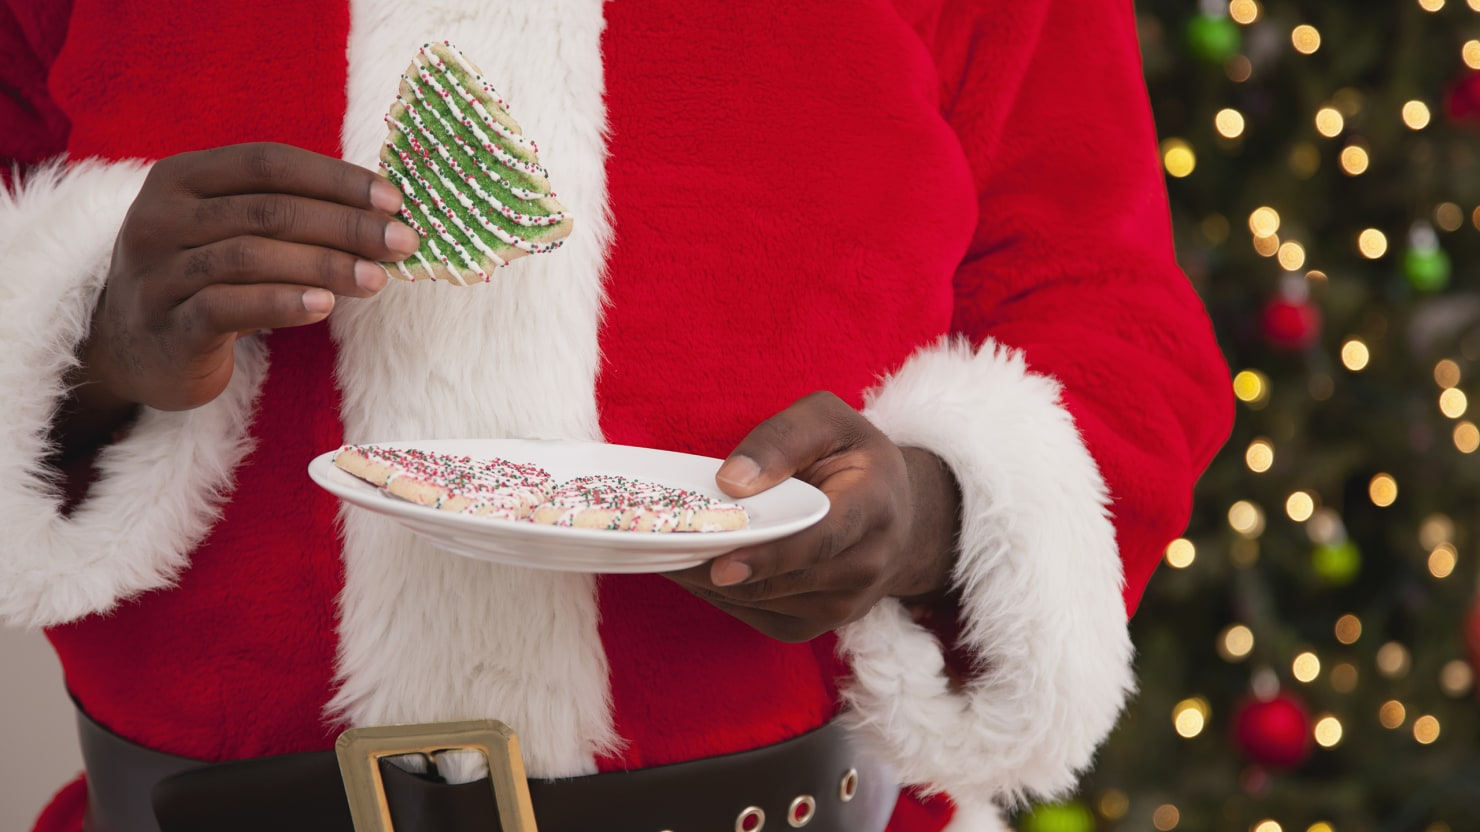 greg votecorbis - The War On Christmas